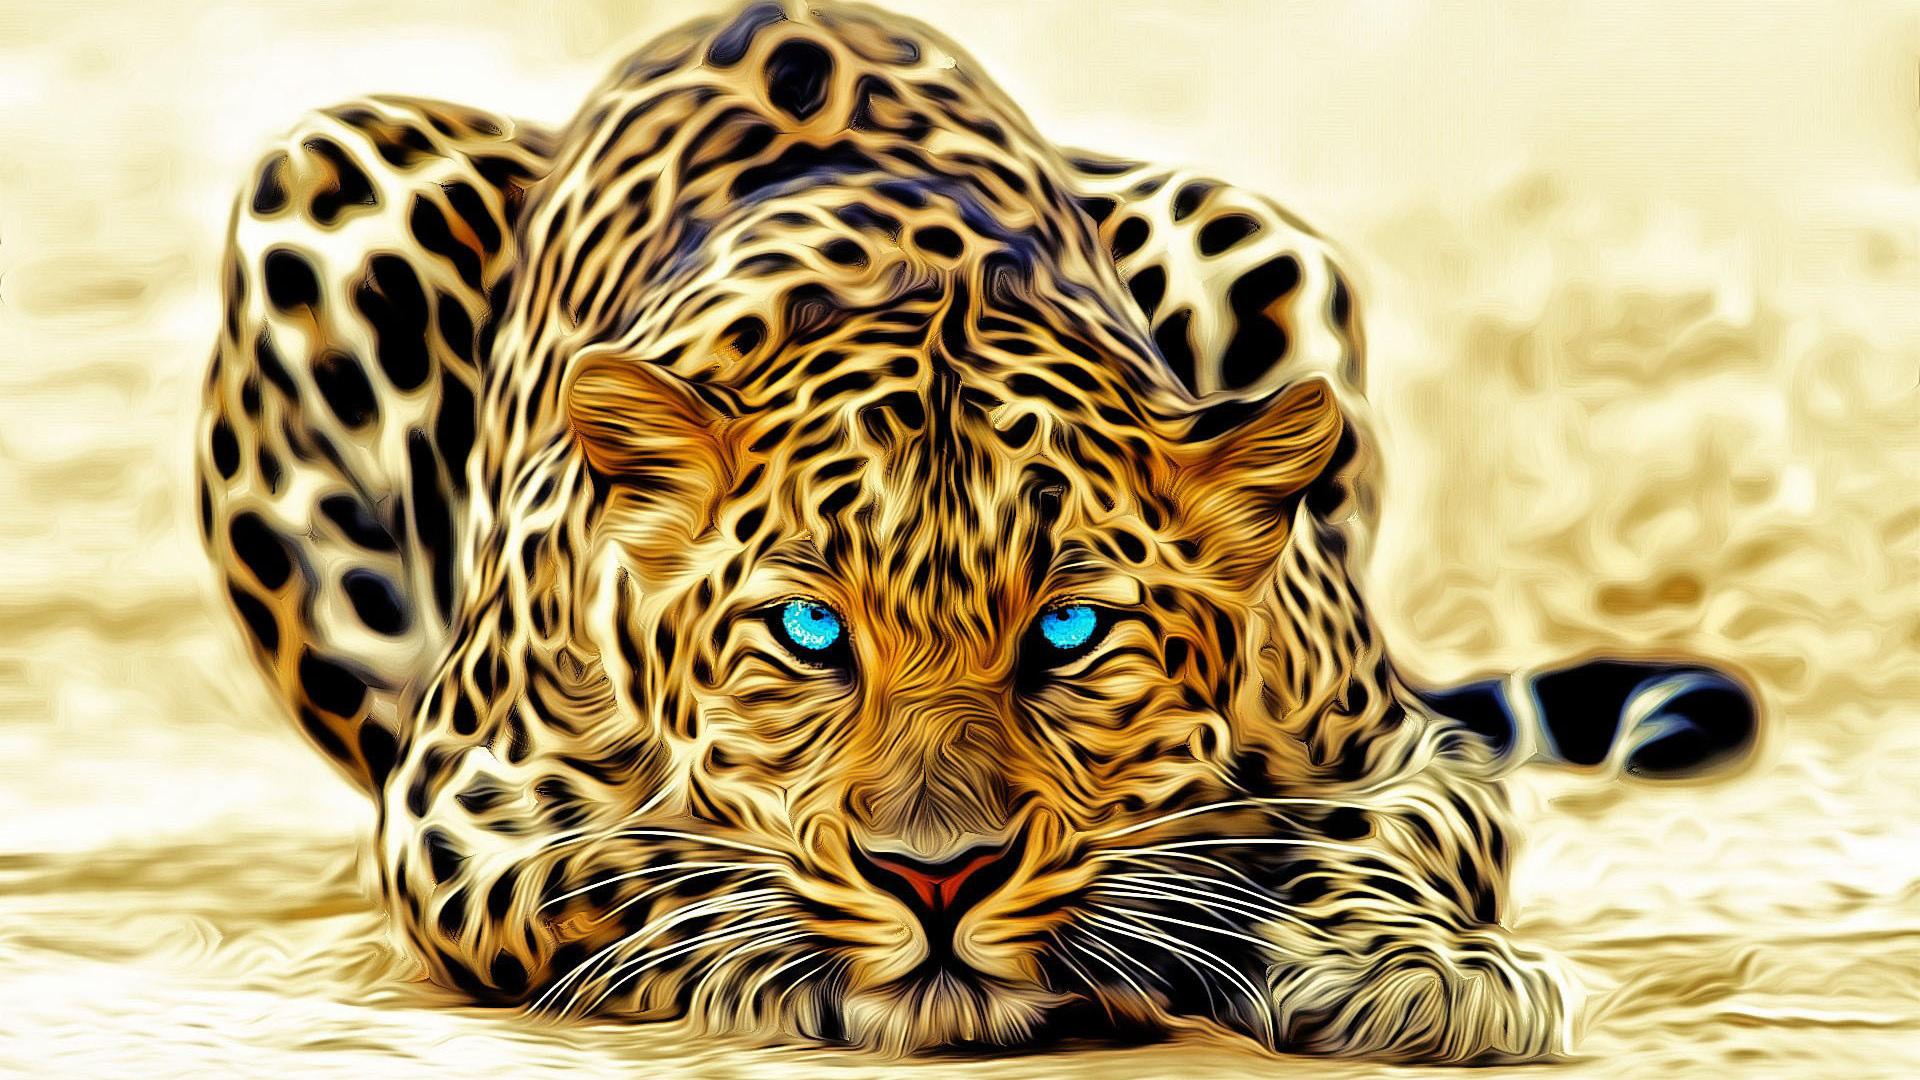 Картинки тигров и леопардов на телефон